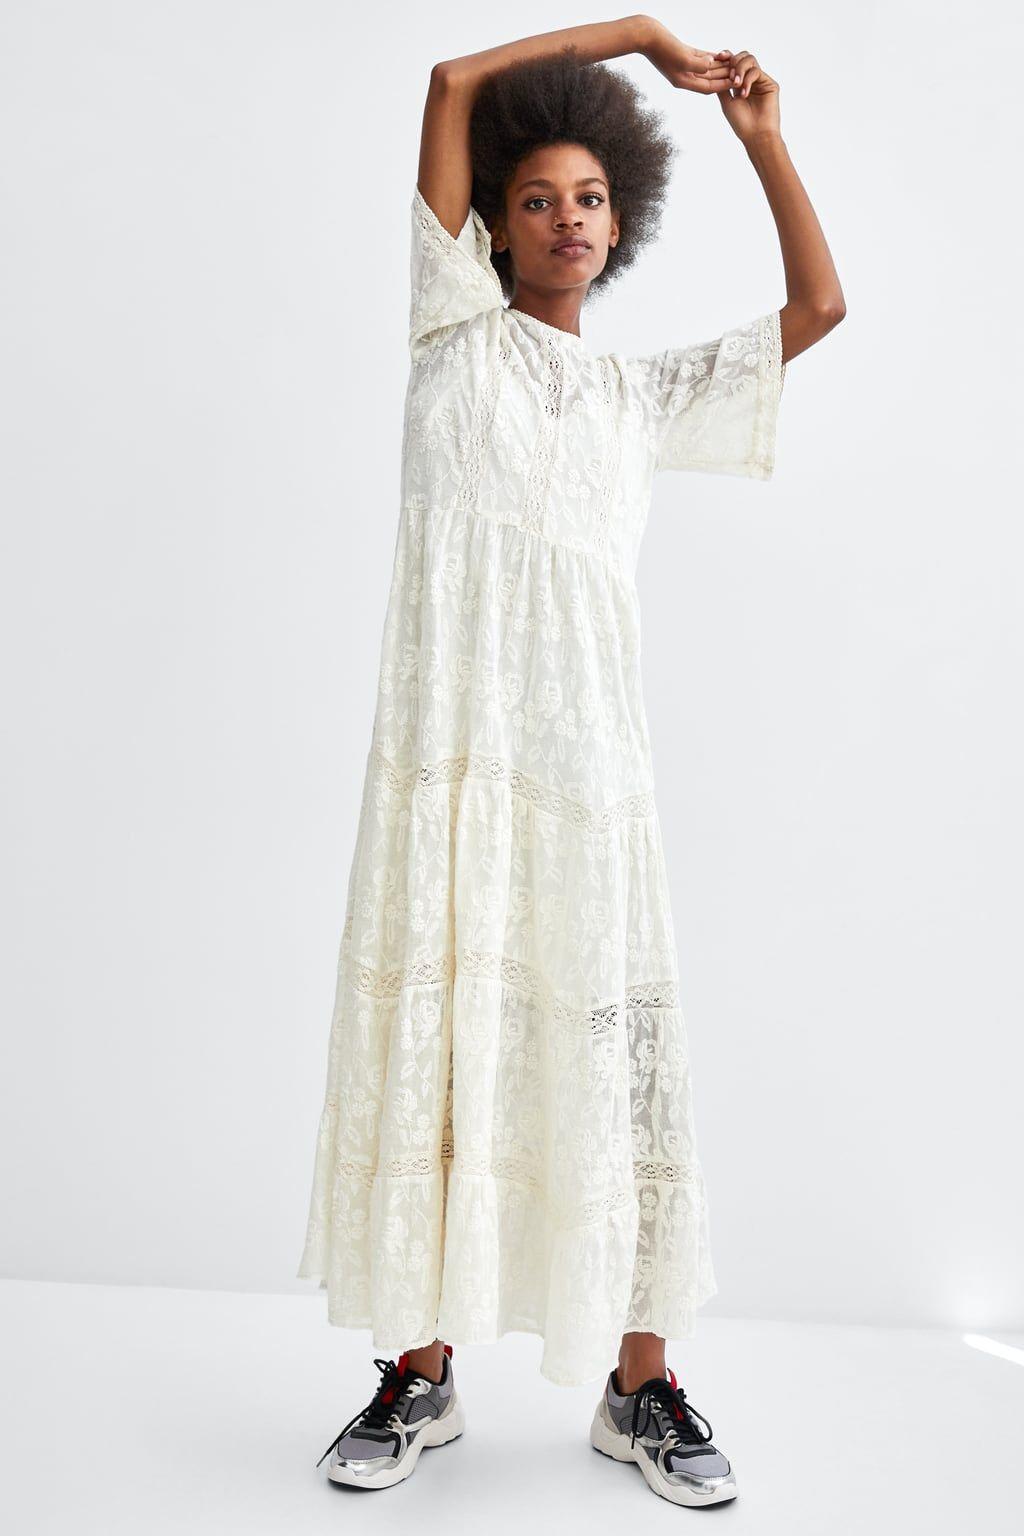 Embroidered romantic dress | Zara wedding dress, Romantic